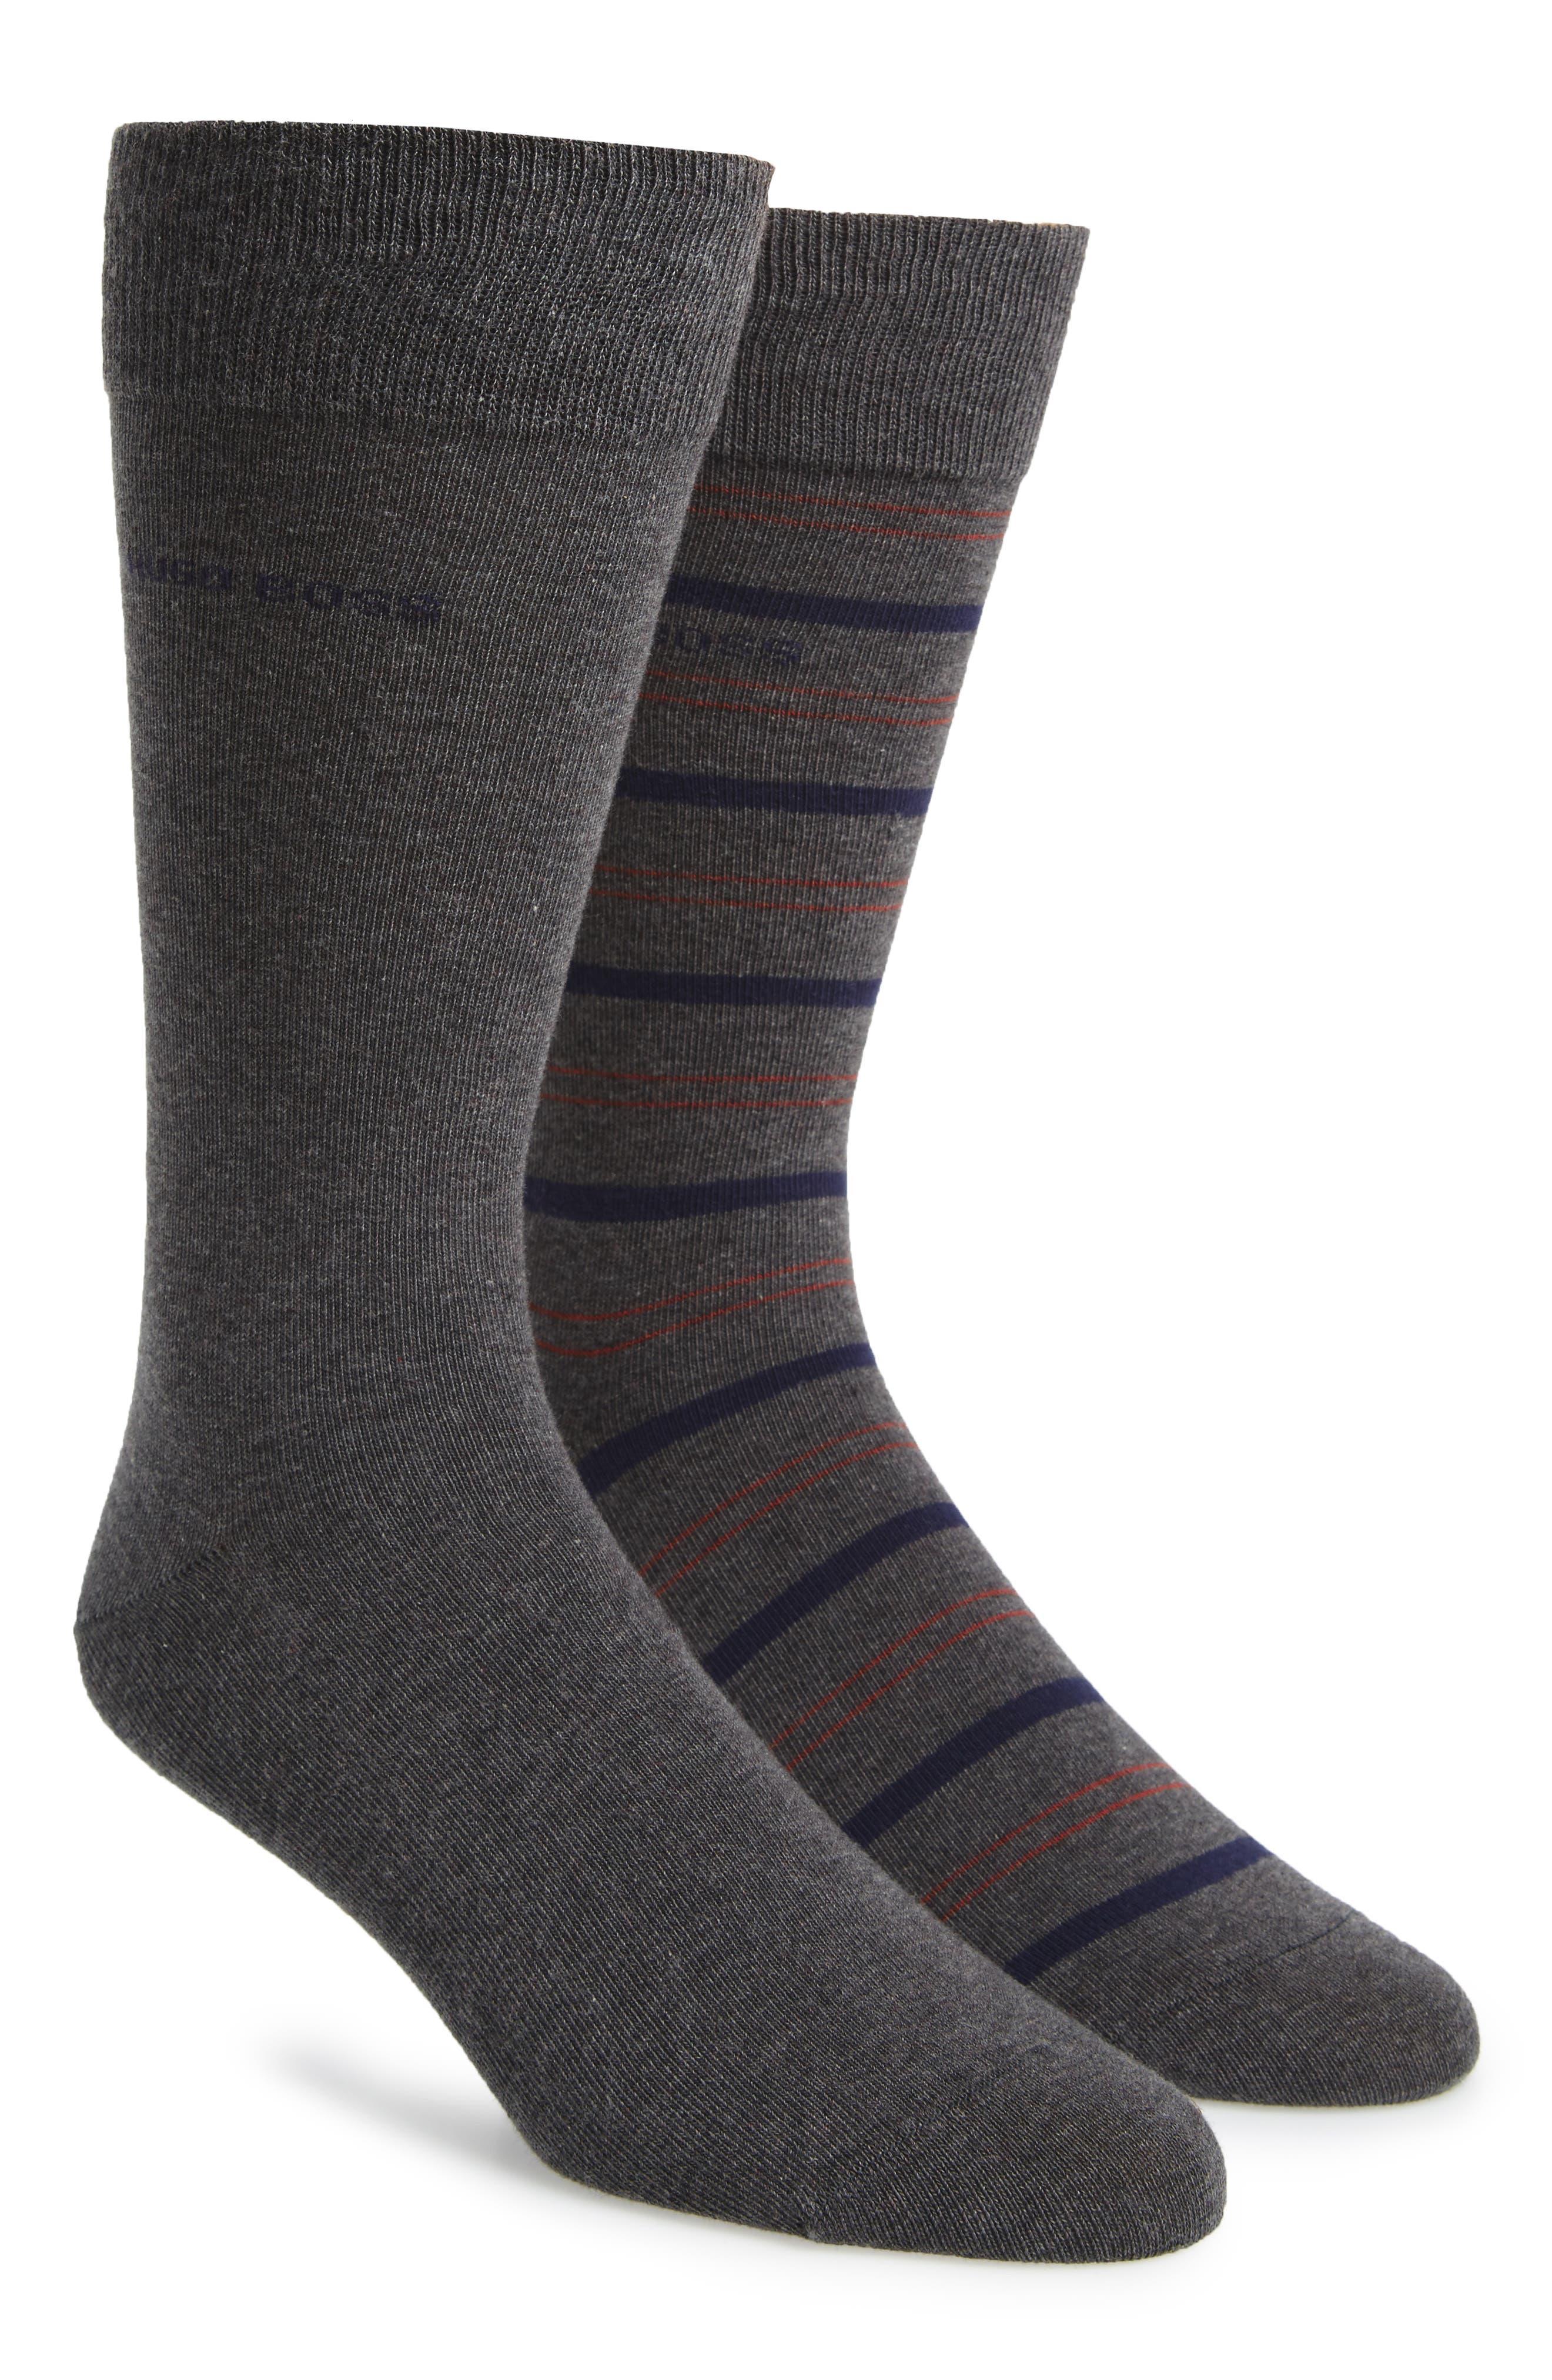 2-Pack Socks,                         Main,                         color, 031